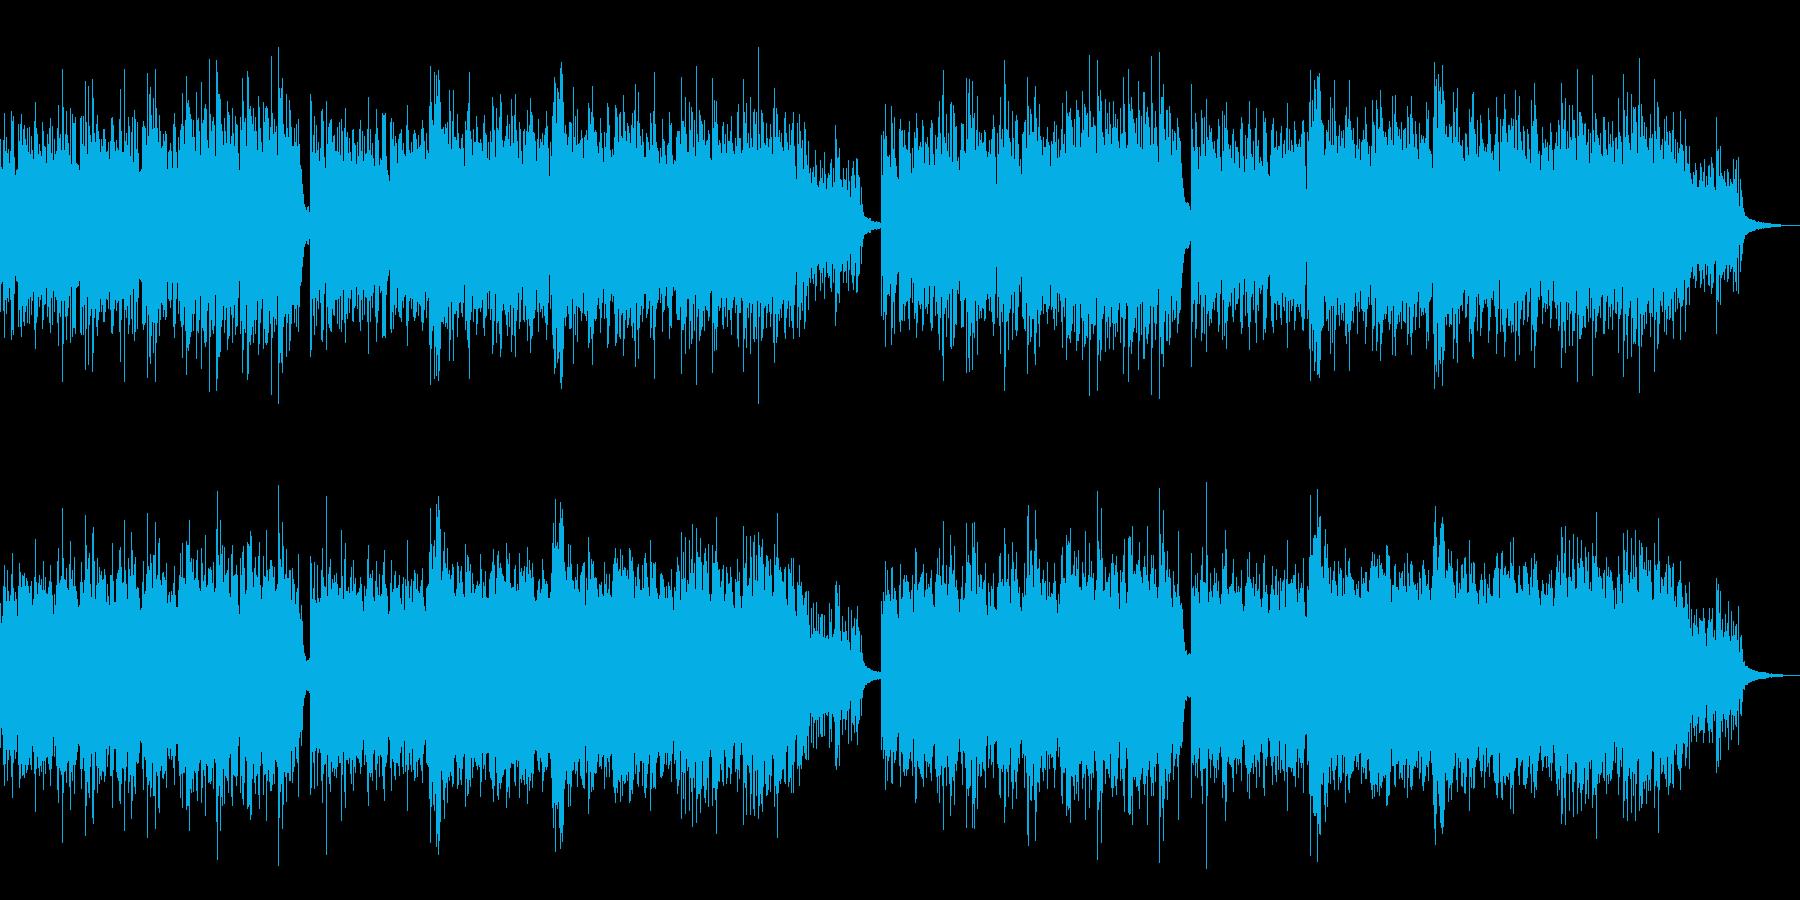 CMや映像作品に 静寂を感じるピアノソロの再生済みの波形